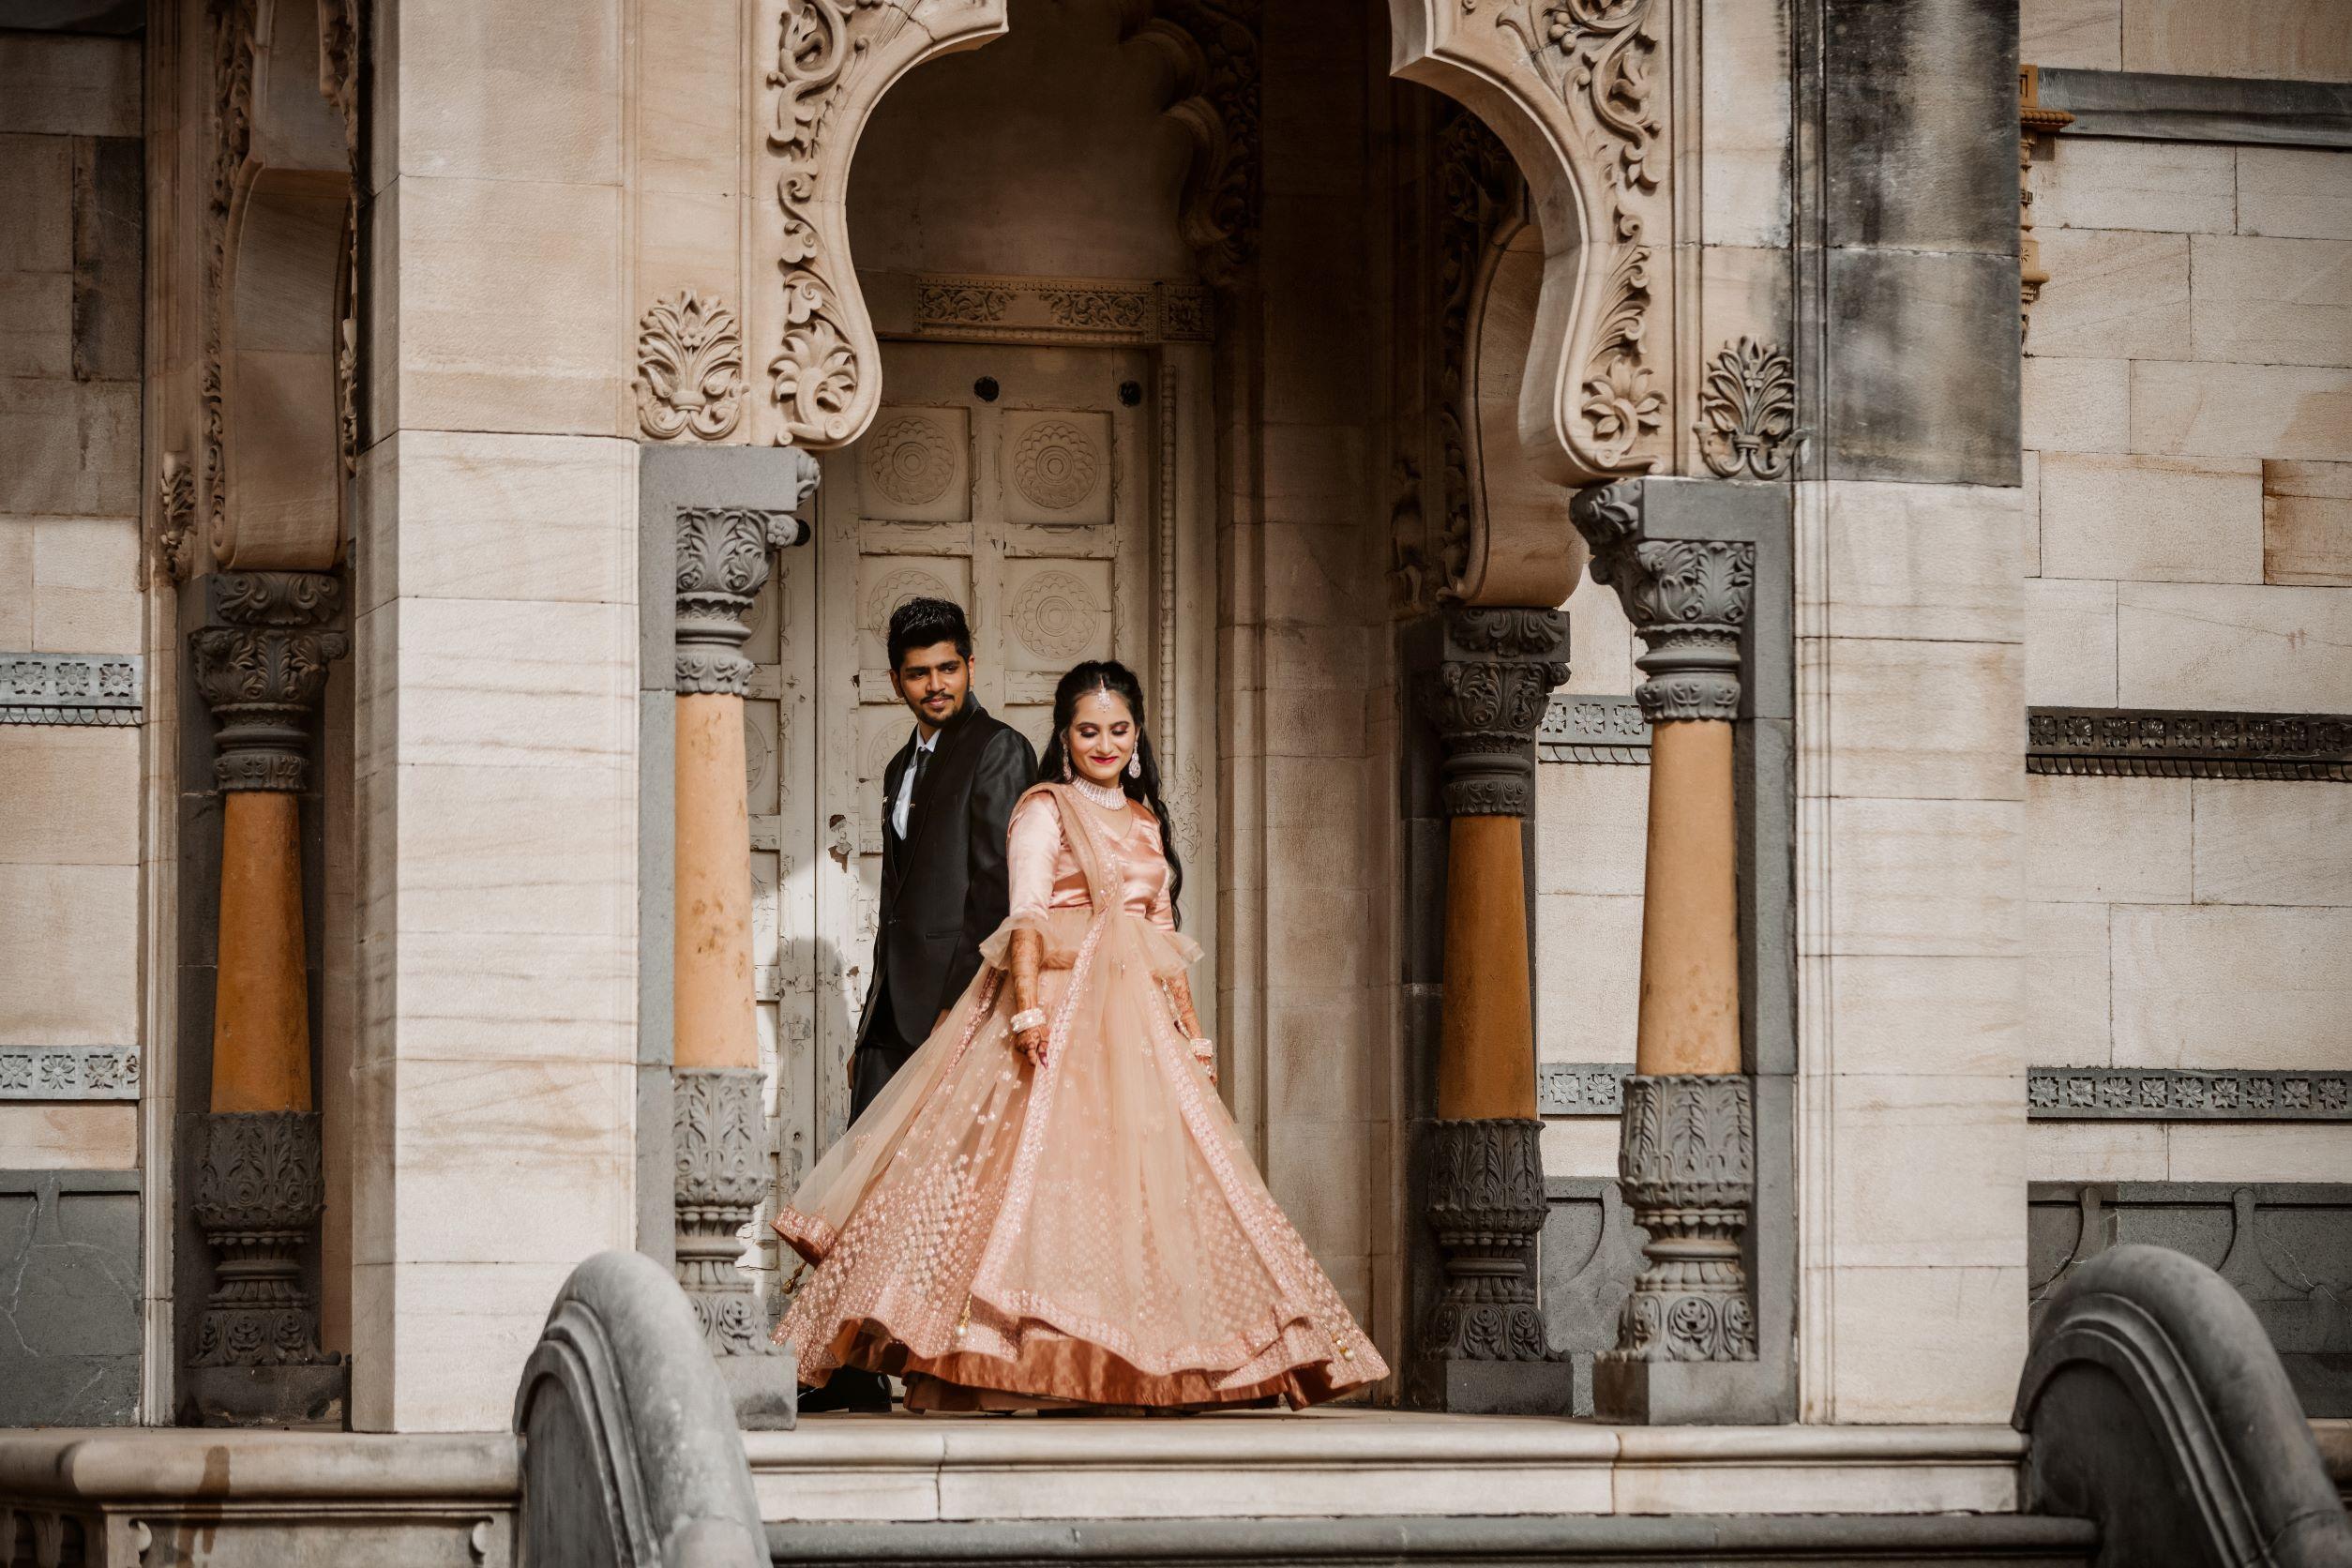 romantic shot of the couple